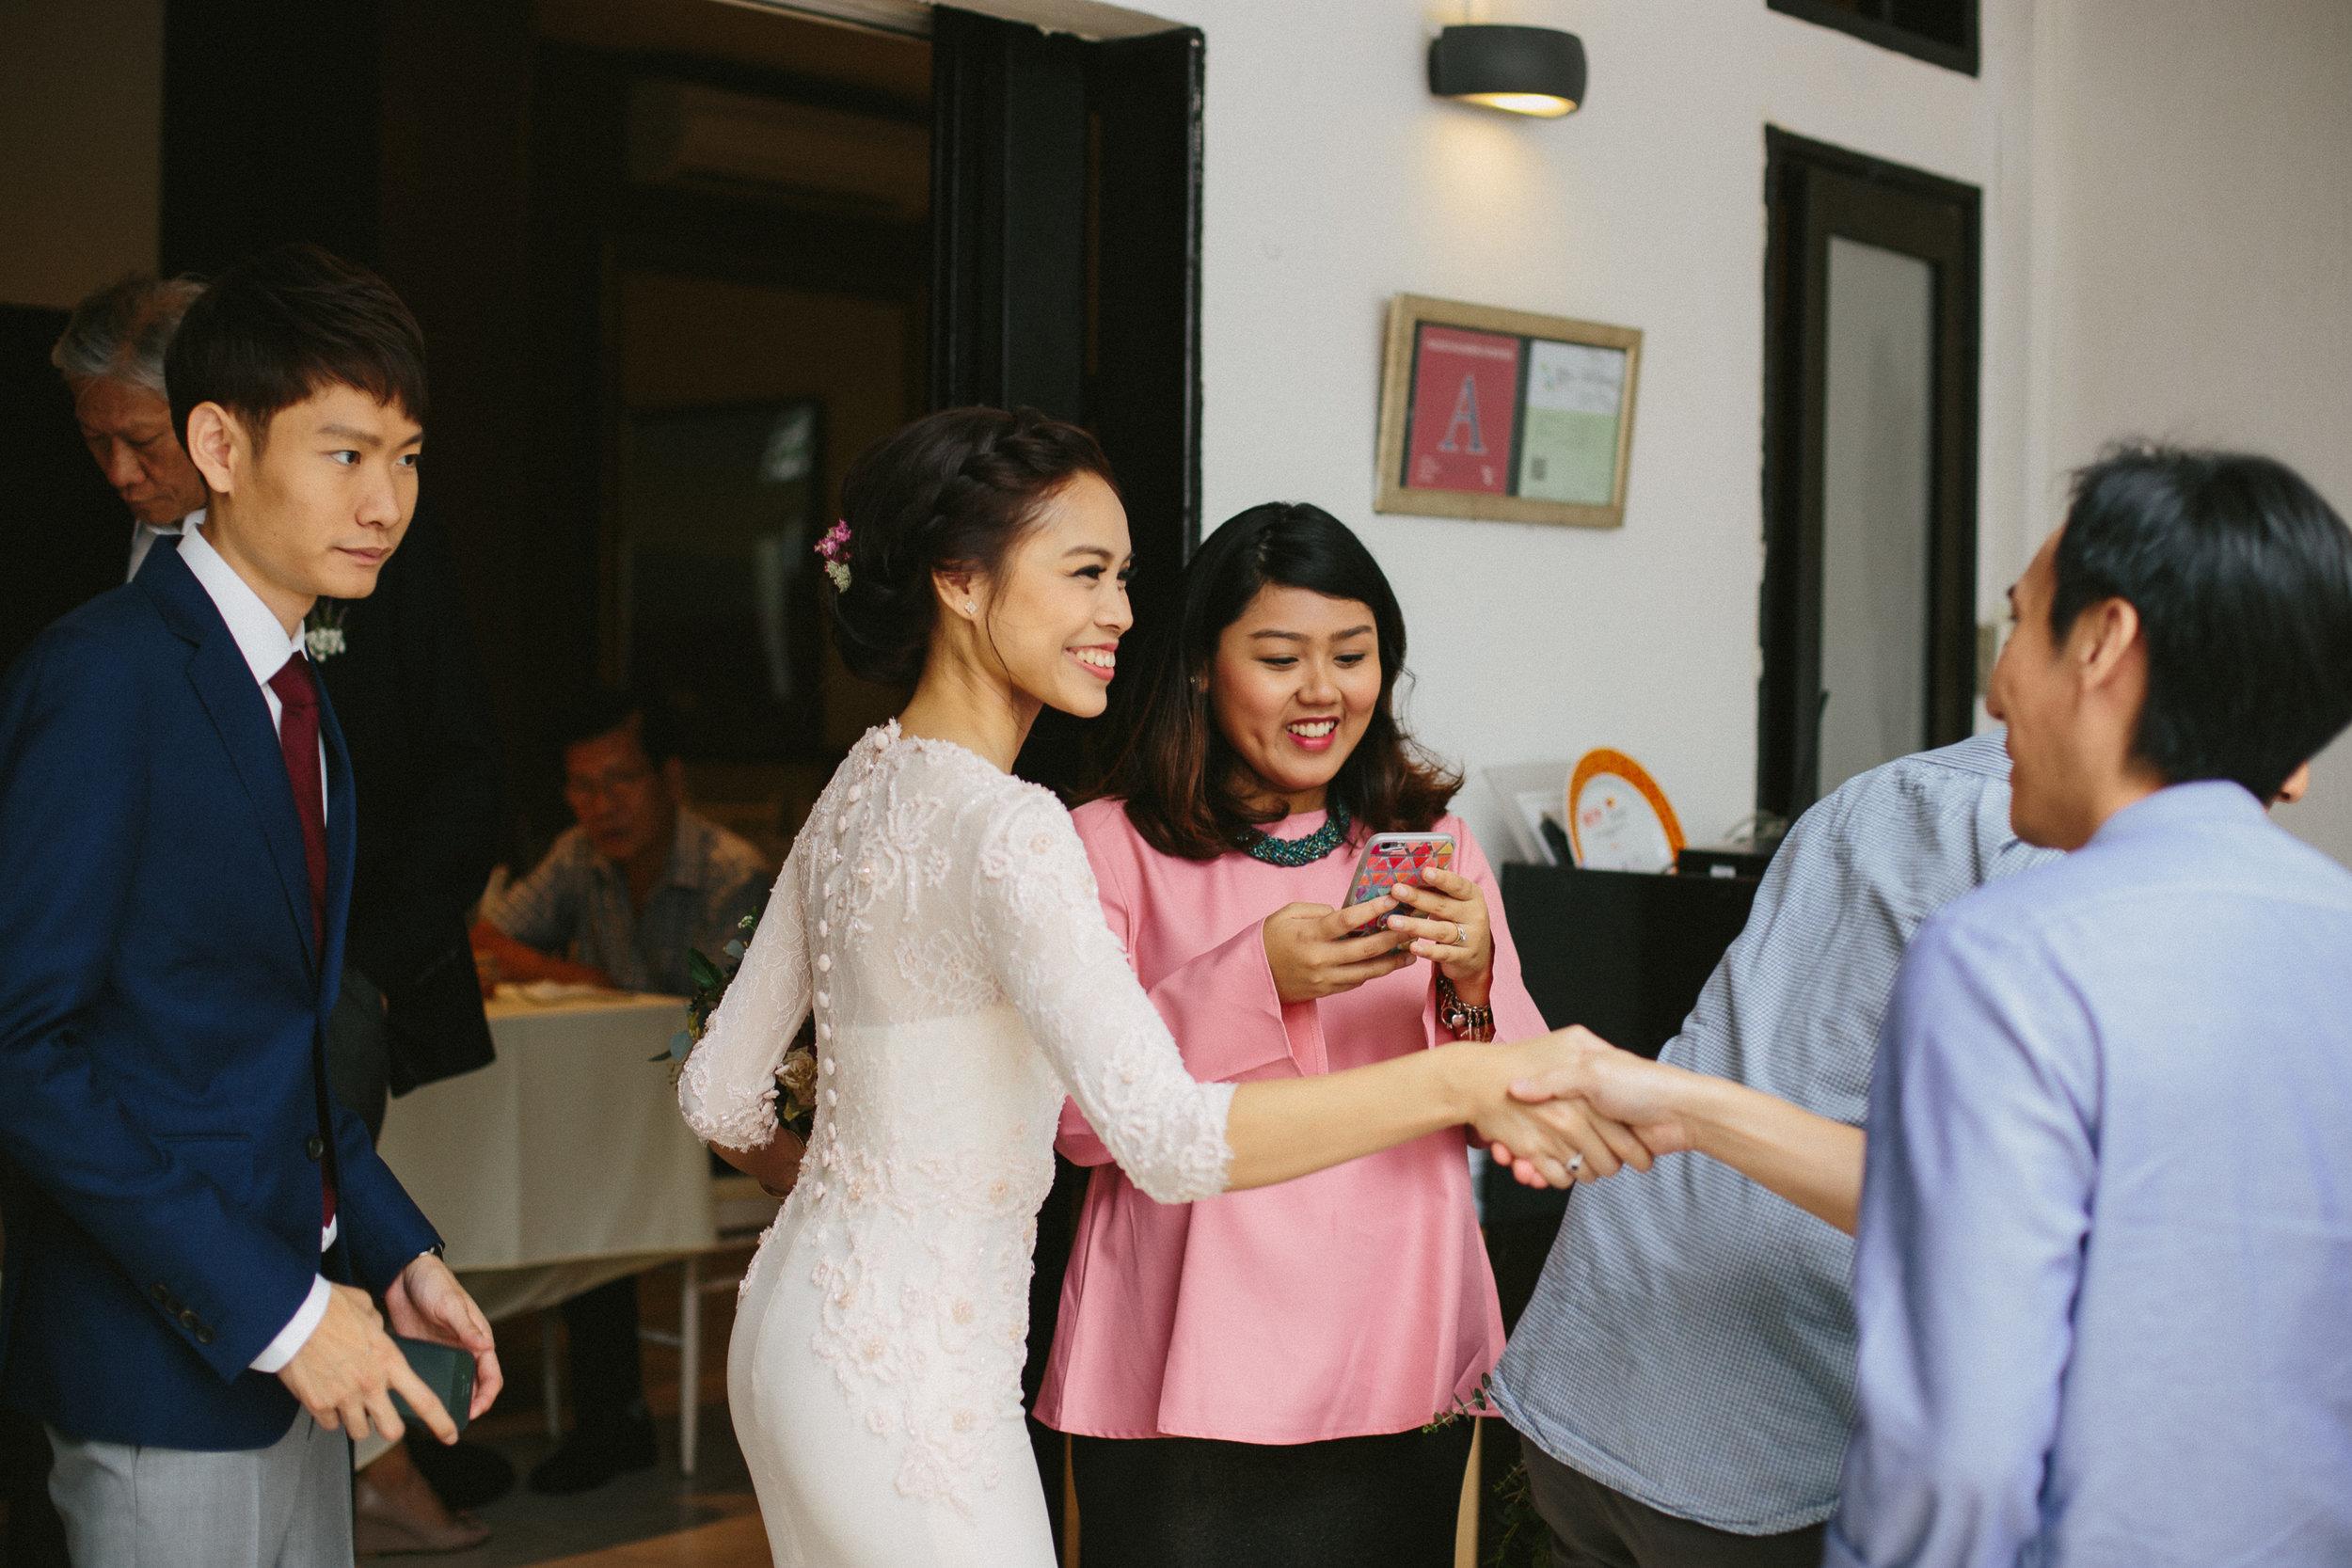 singapore-wedding-photographer-fadilah-kwan-028.jpg